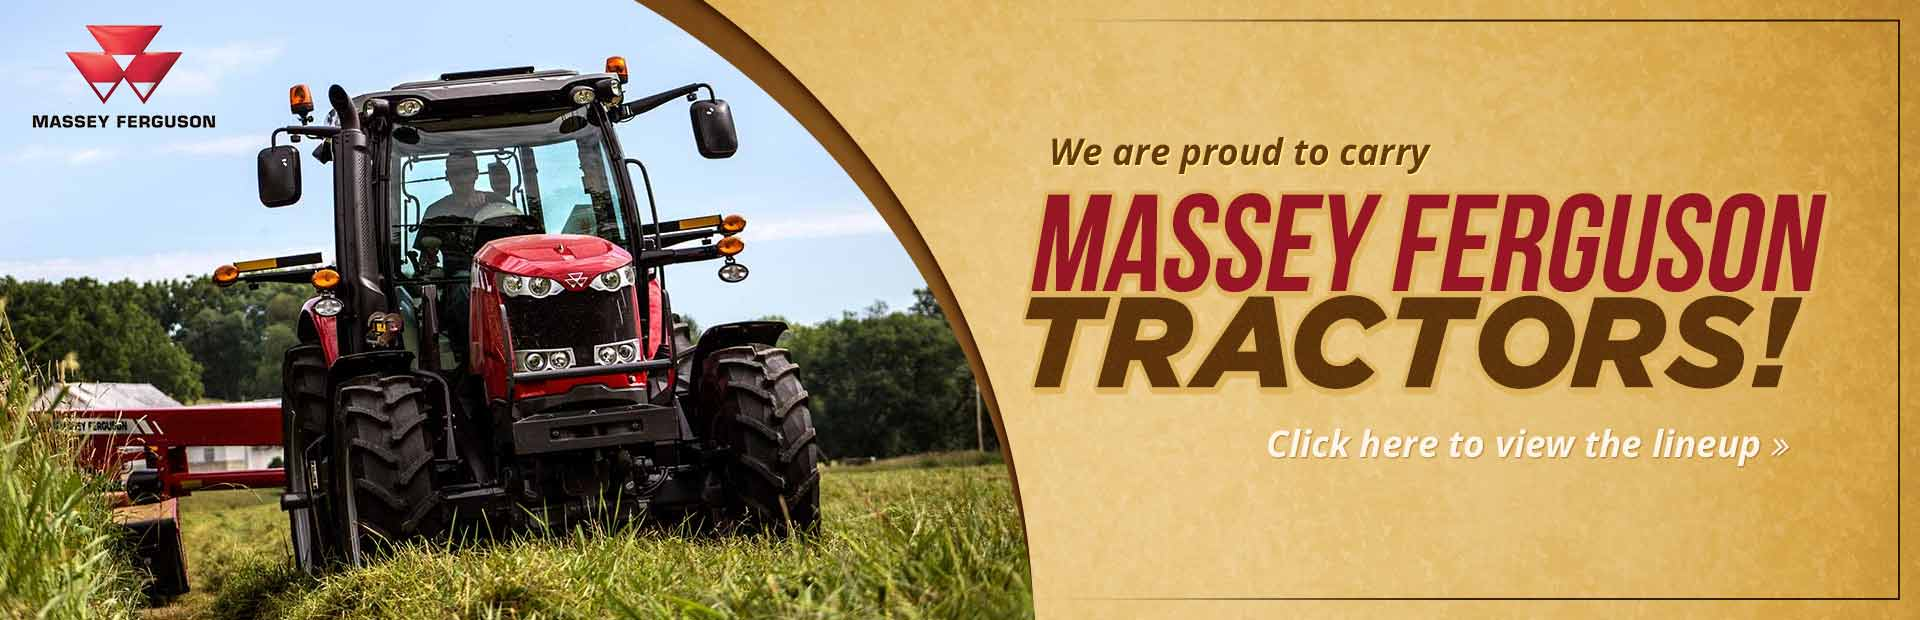 Home Waterman Farm Machinery Co , Inc Sabattus, ME 207 375 6561